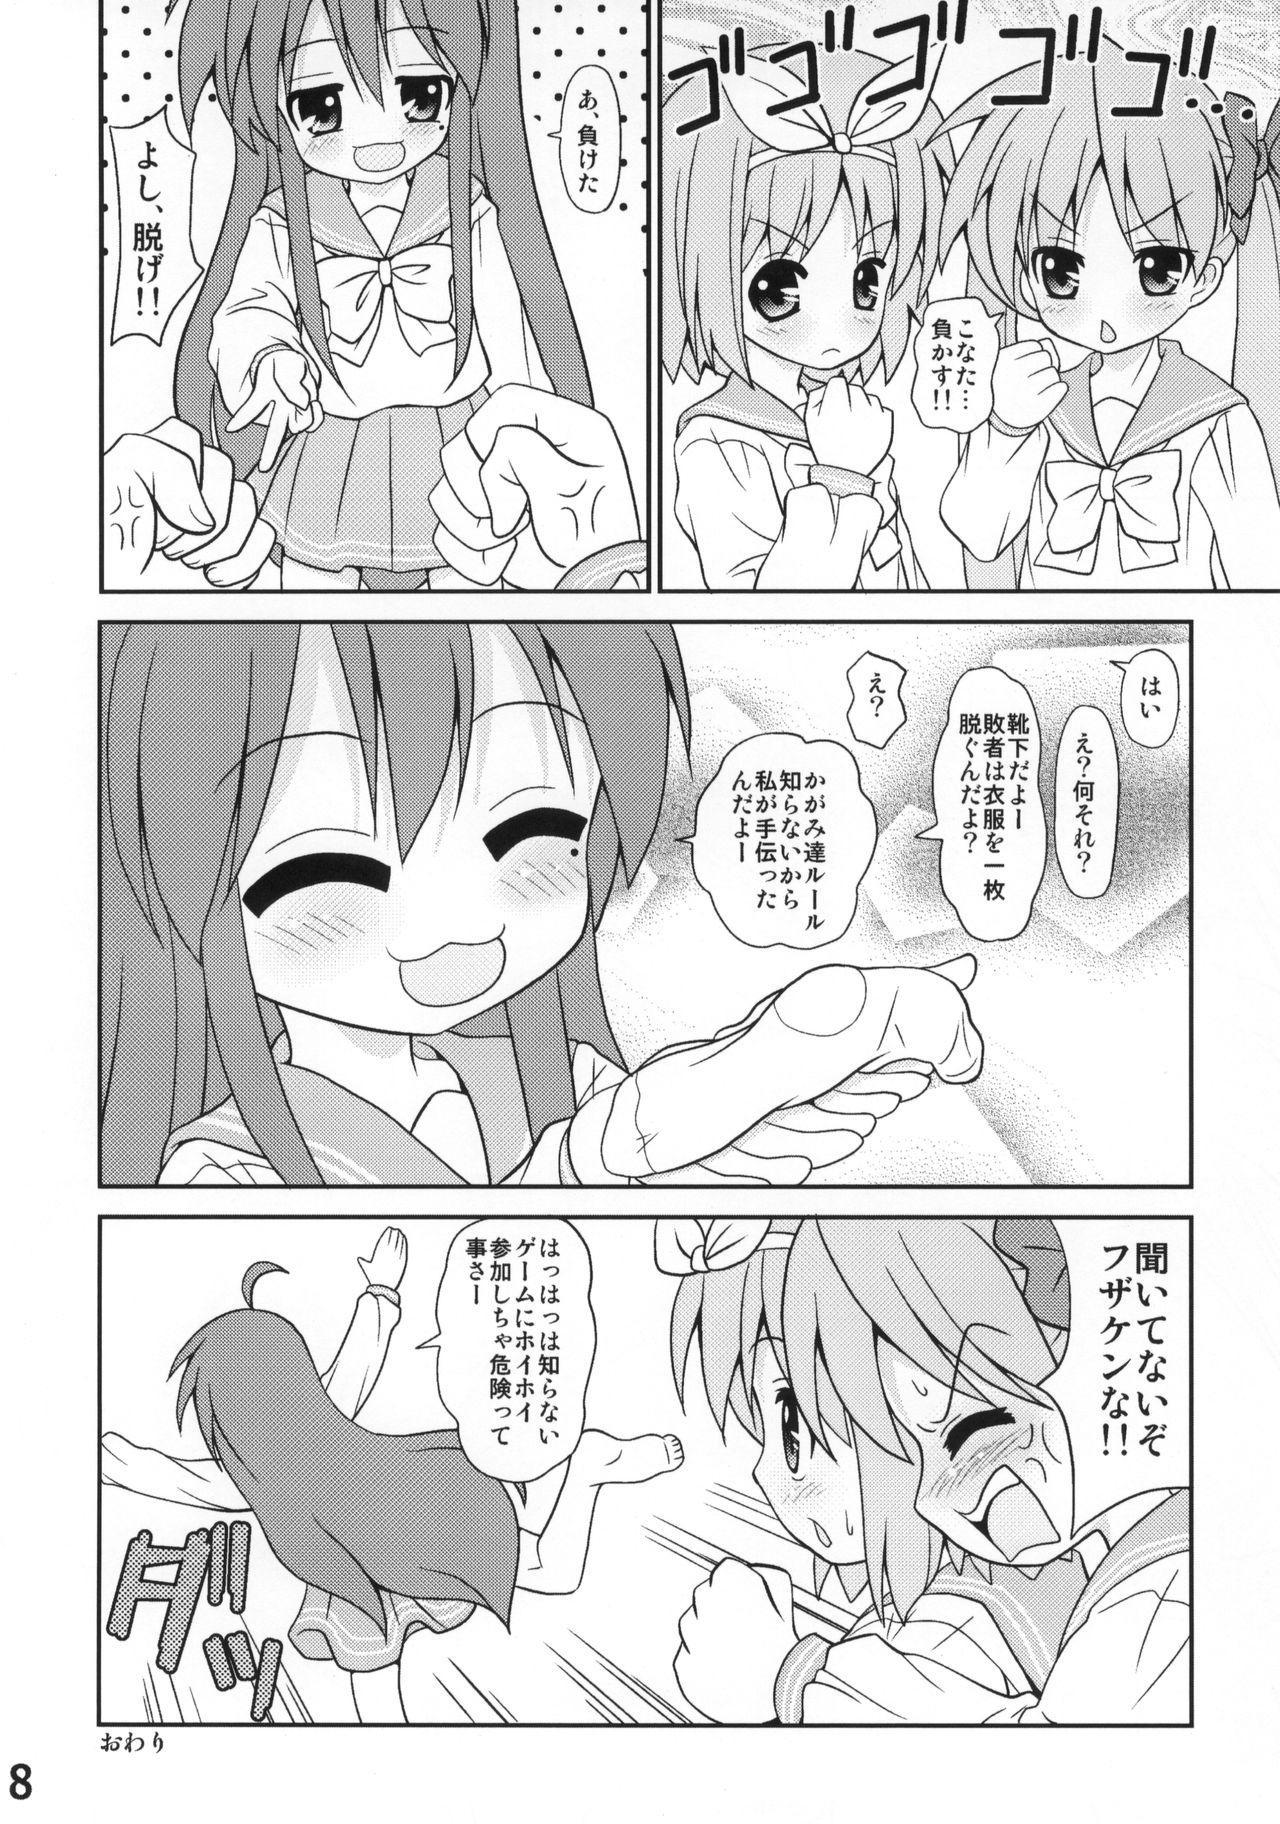 Lucky-jou Pantsu Hunter Vol. 2 6